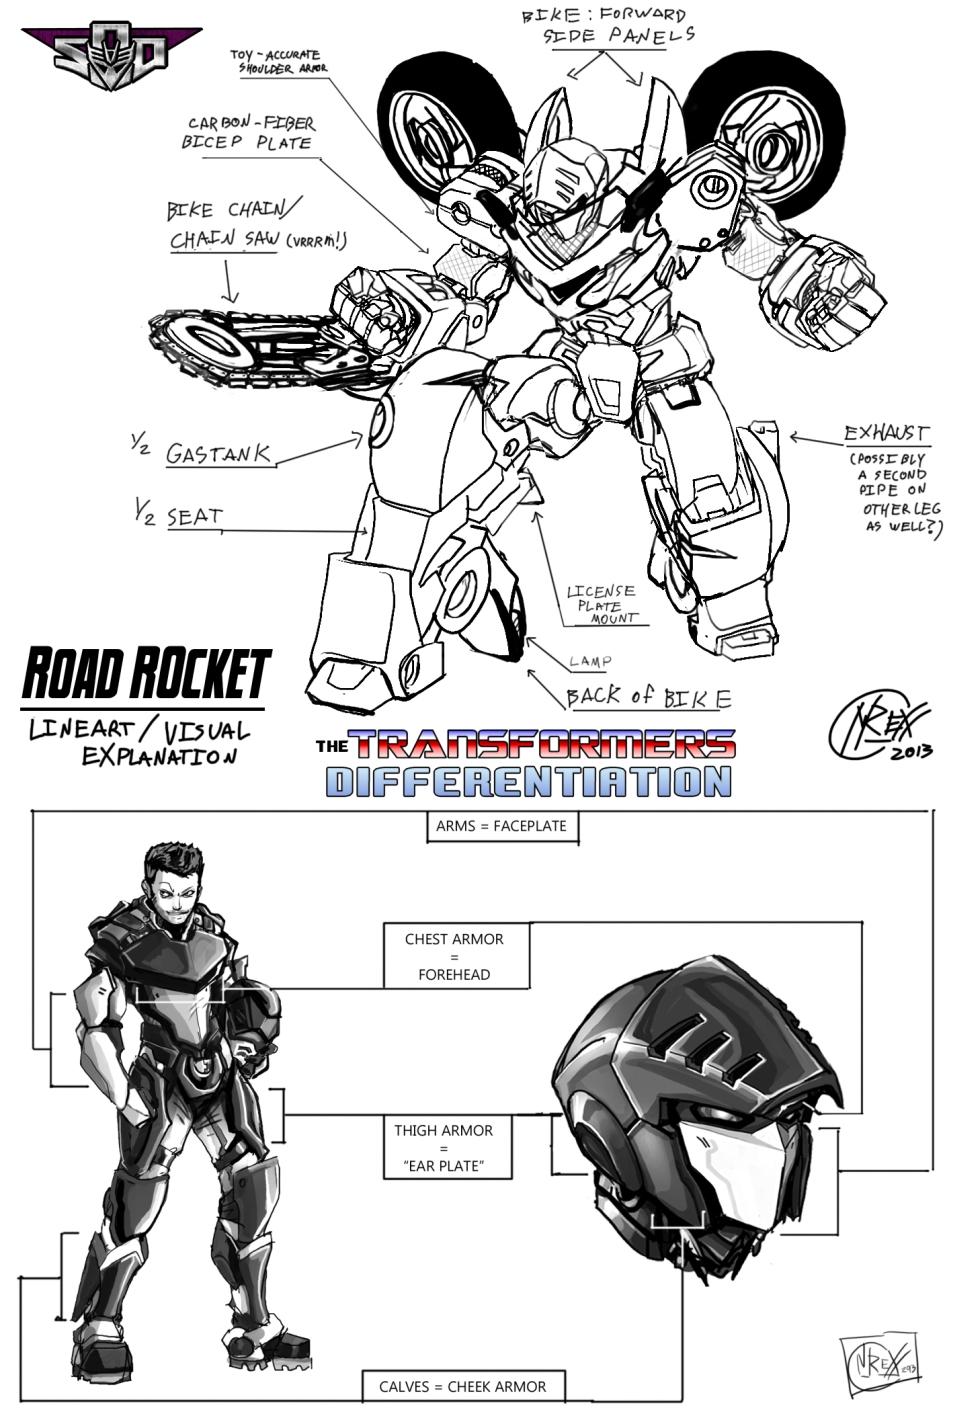 Ation RoadRocket HeadmMaster blueprints